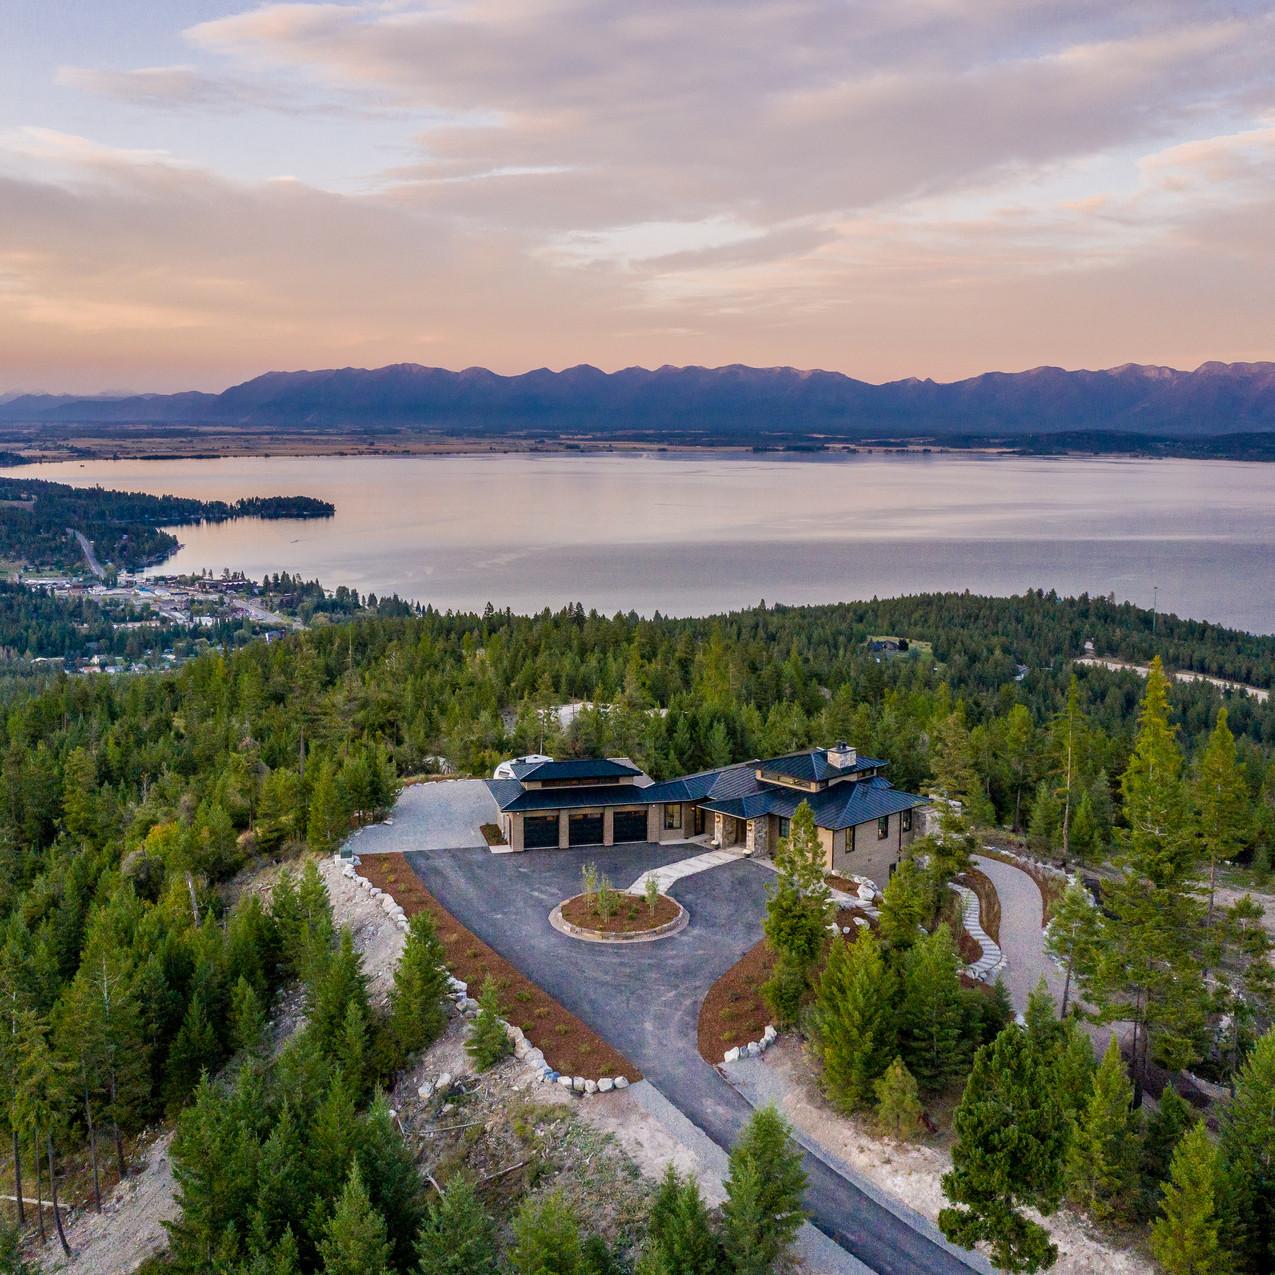 Stemberg Aerial Lake View 3